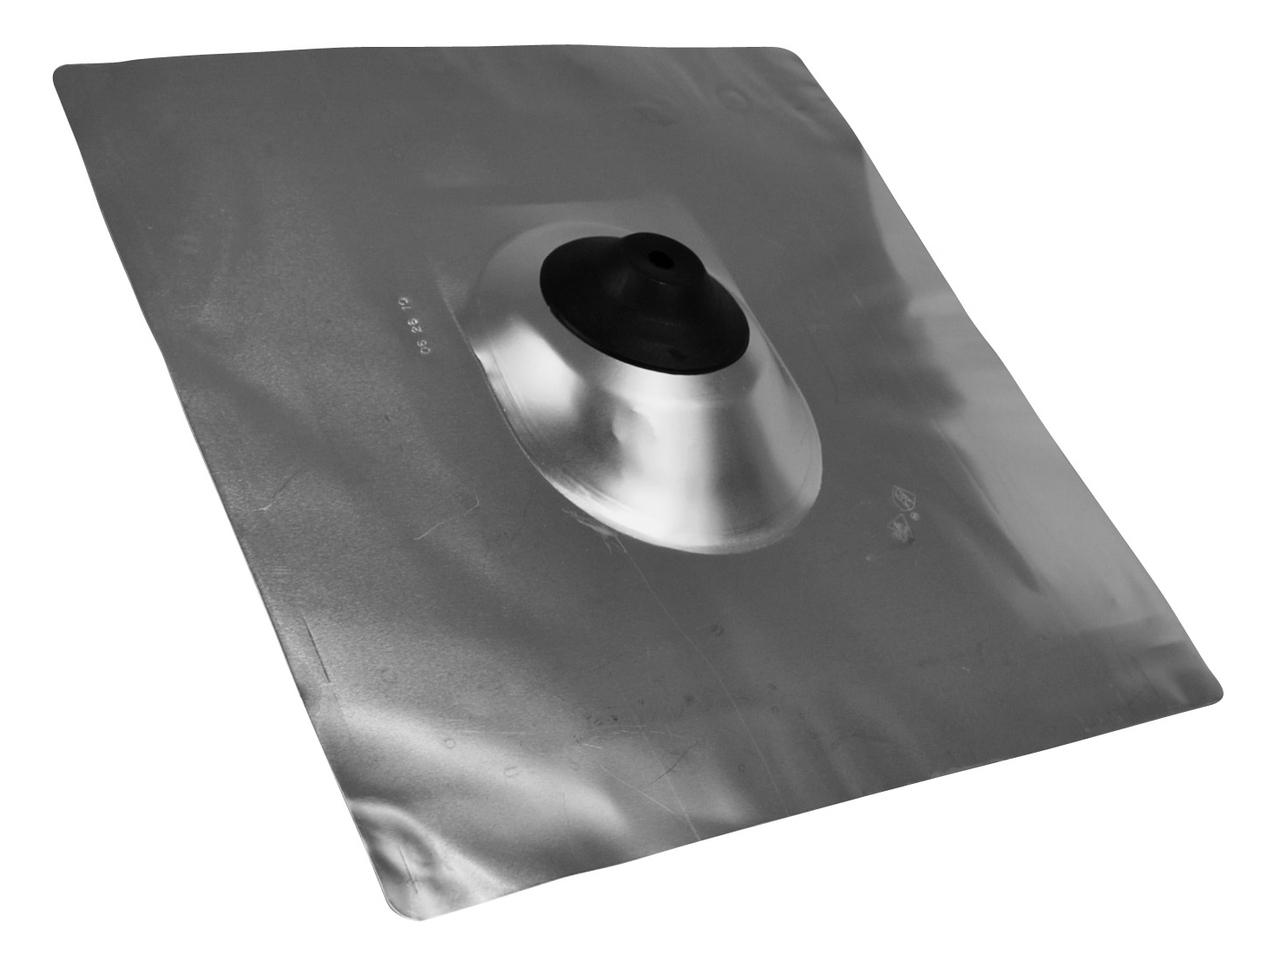 OATEY/RD Kincaide: Aluminum No-Calk Roof Flashing - 0.5